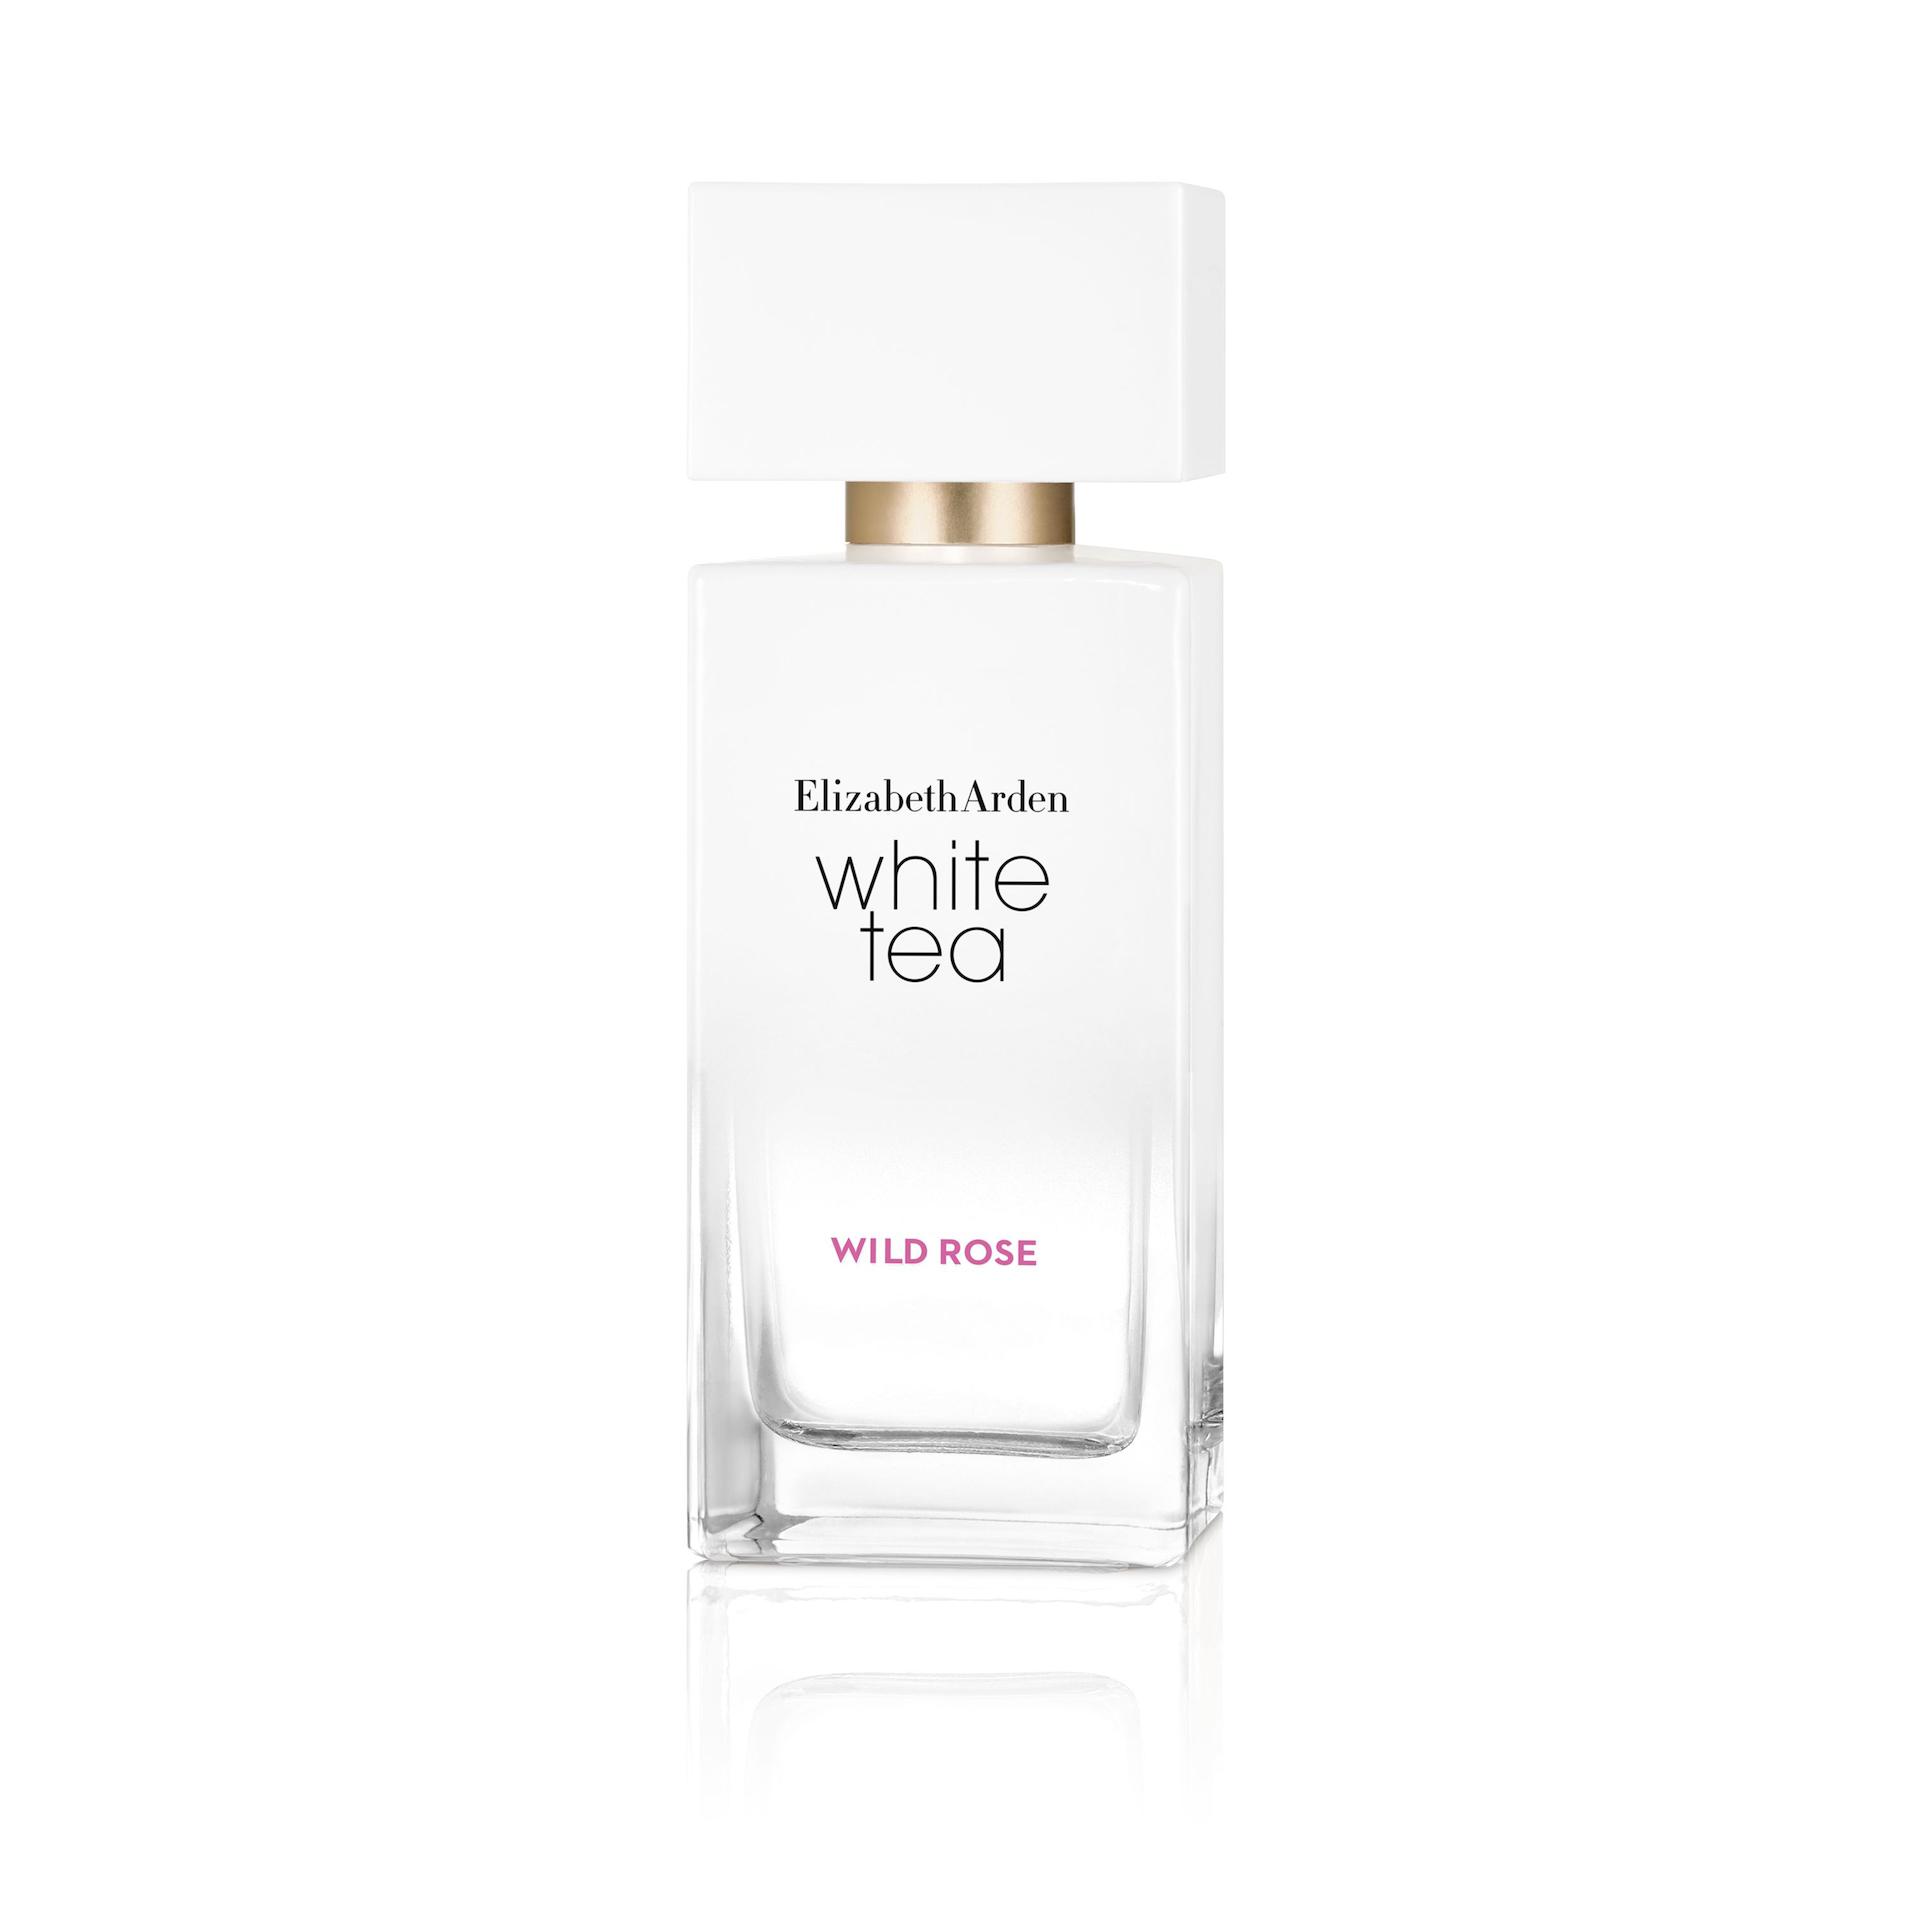 Elizabeth Arden parfym, makeup & hudvård KICKS